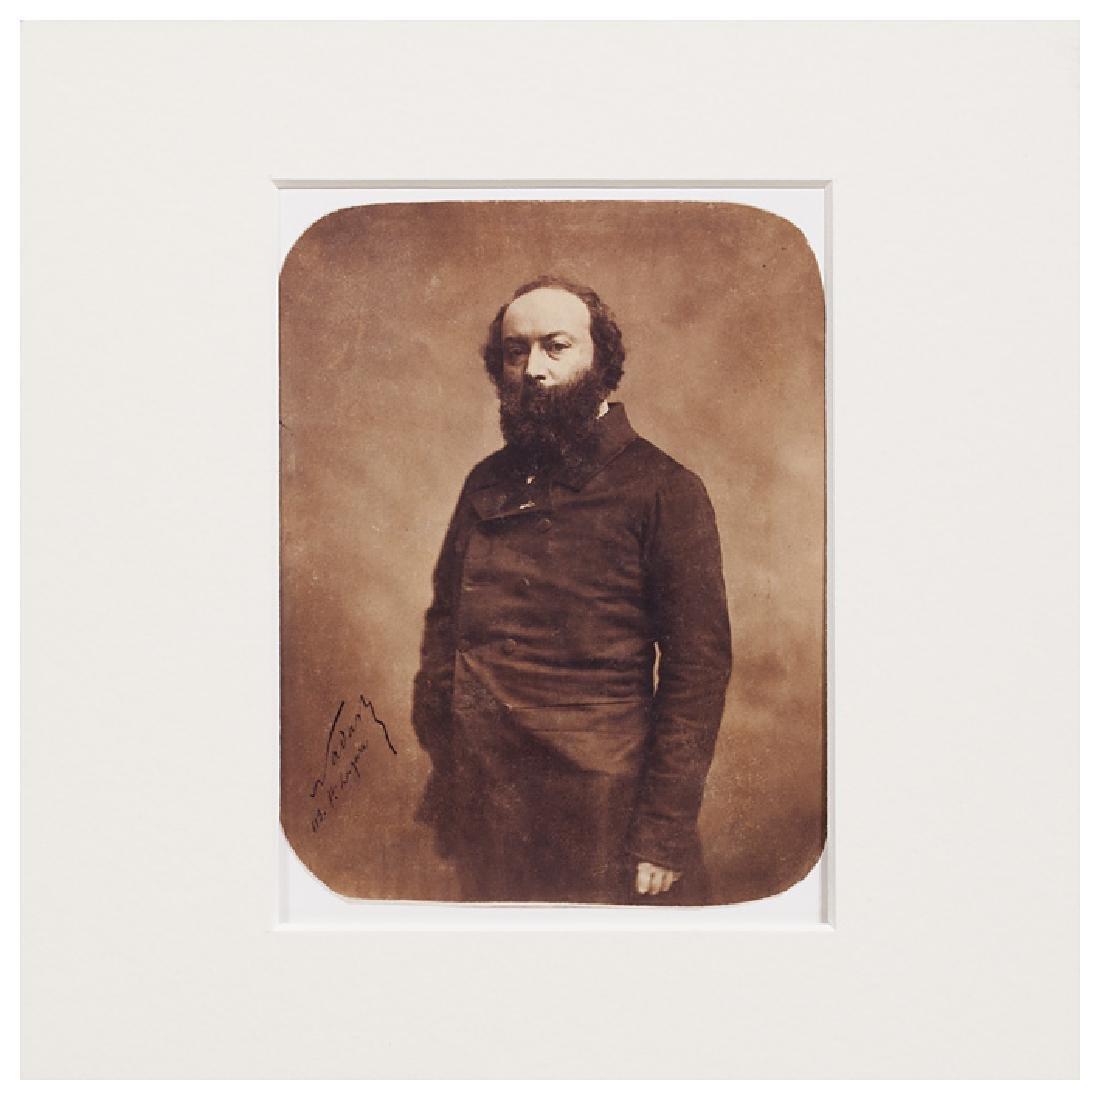 Nadar (French, 1820 - 1910) [Gaspard Félix Tournachon] - 2